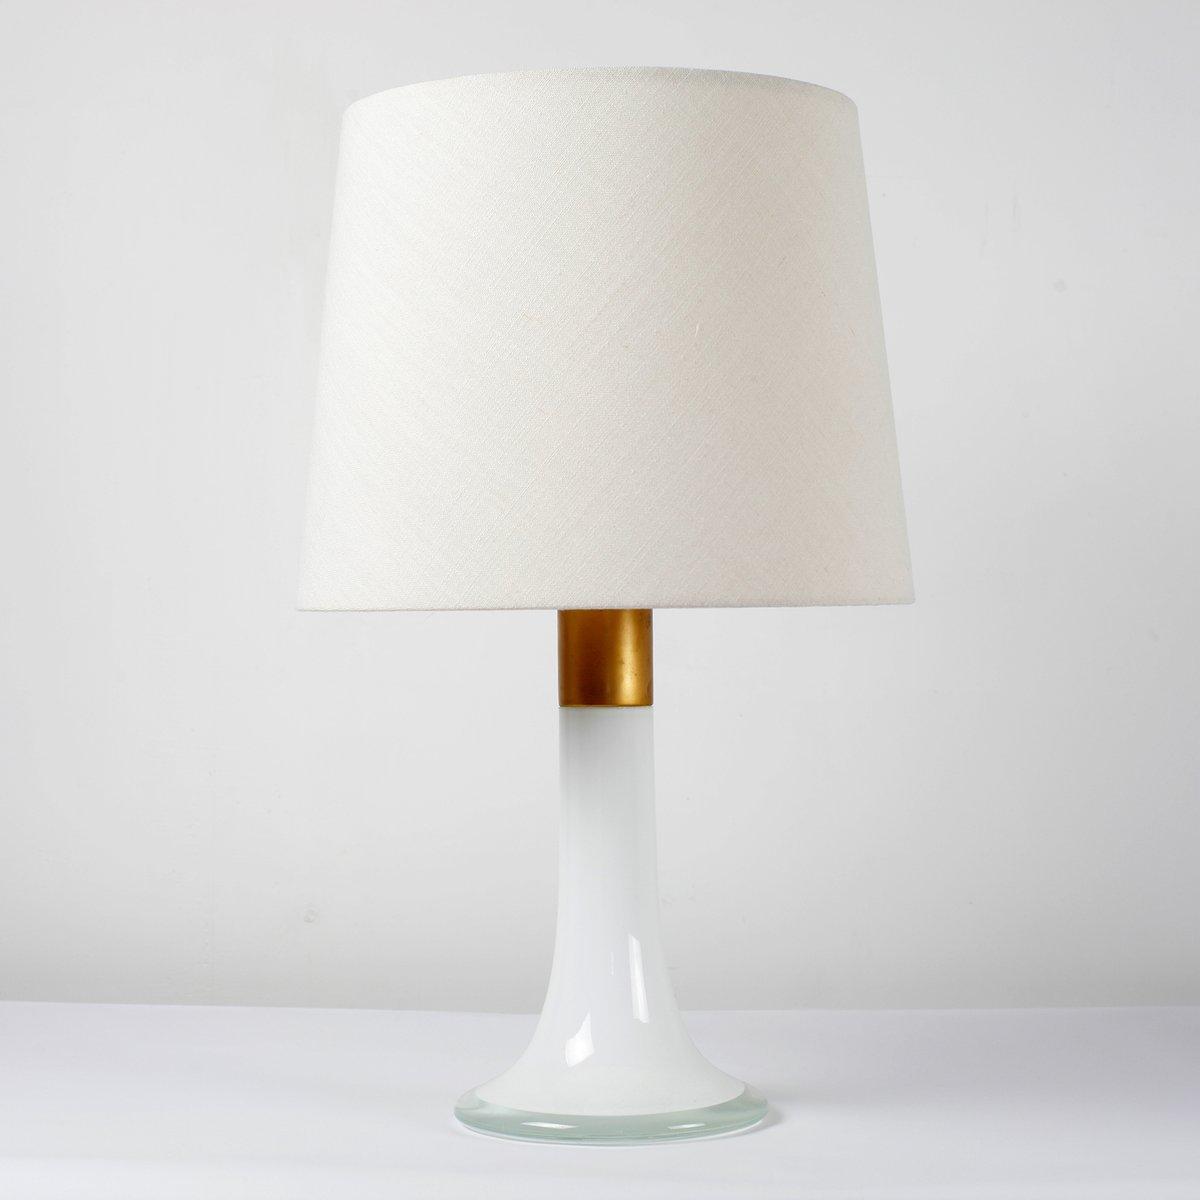 lampen von lisa johansson pape f r stockmann orno 1960er. Black Bedroom Furniture Sets. Home Design Ideas